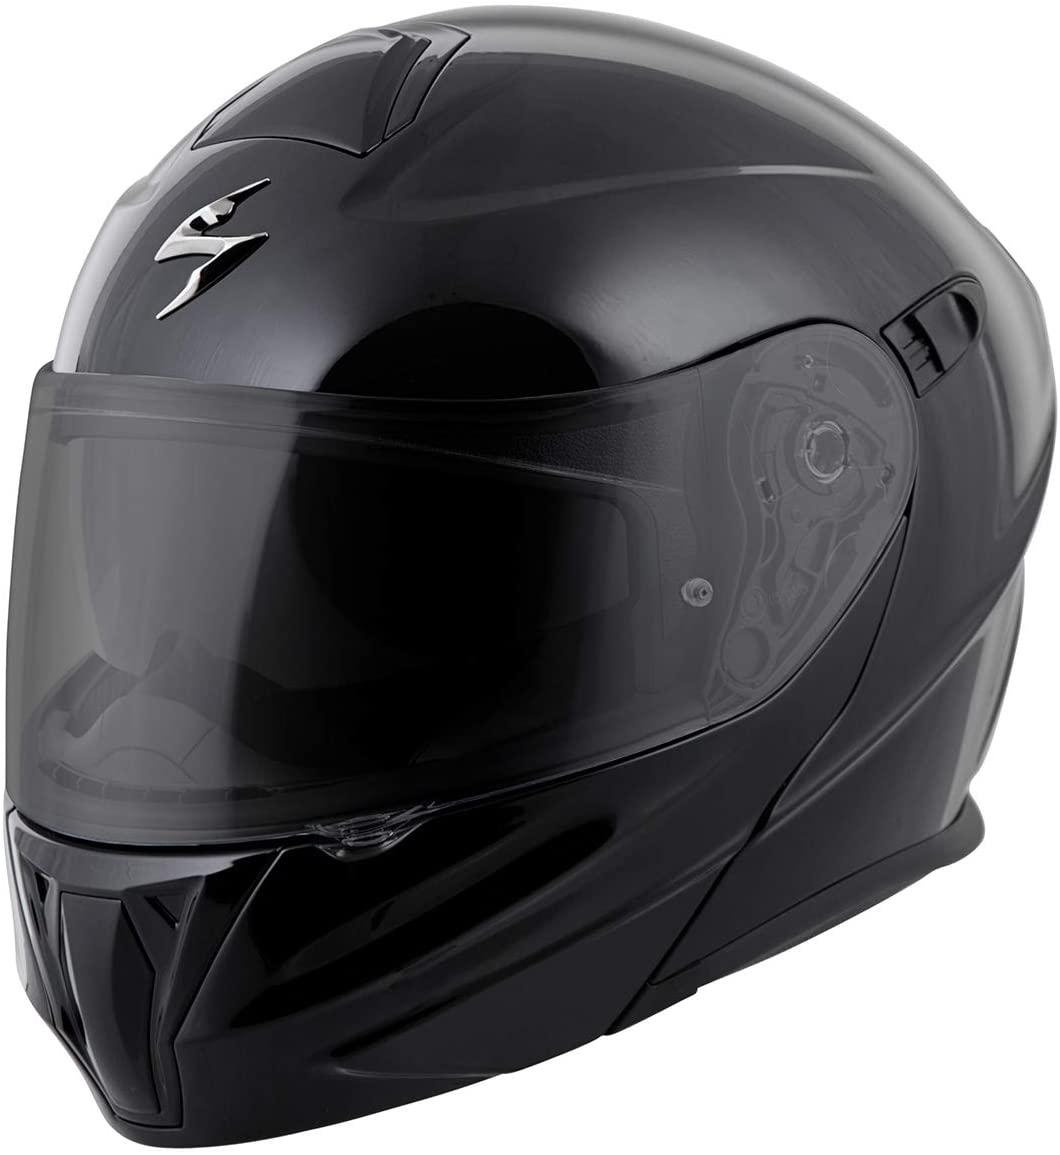 ScorpionExo EXO-GT920 Full Face Modular Helmet (Solid Black, X-Small)